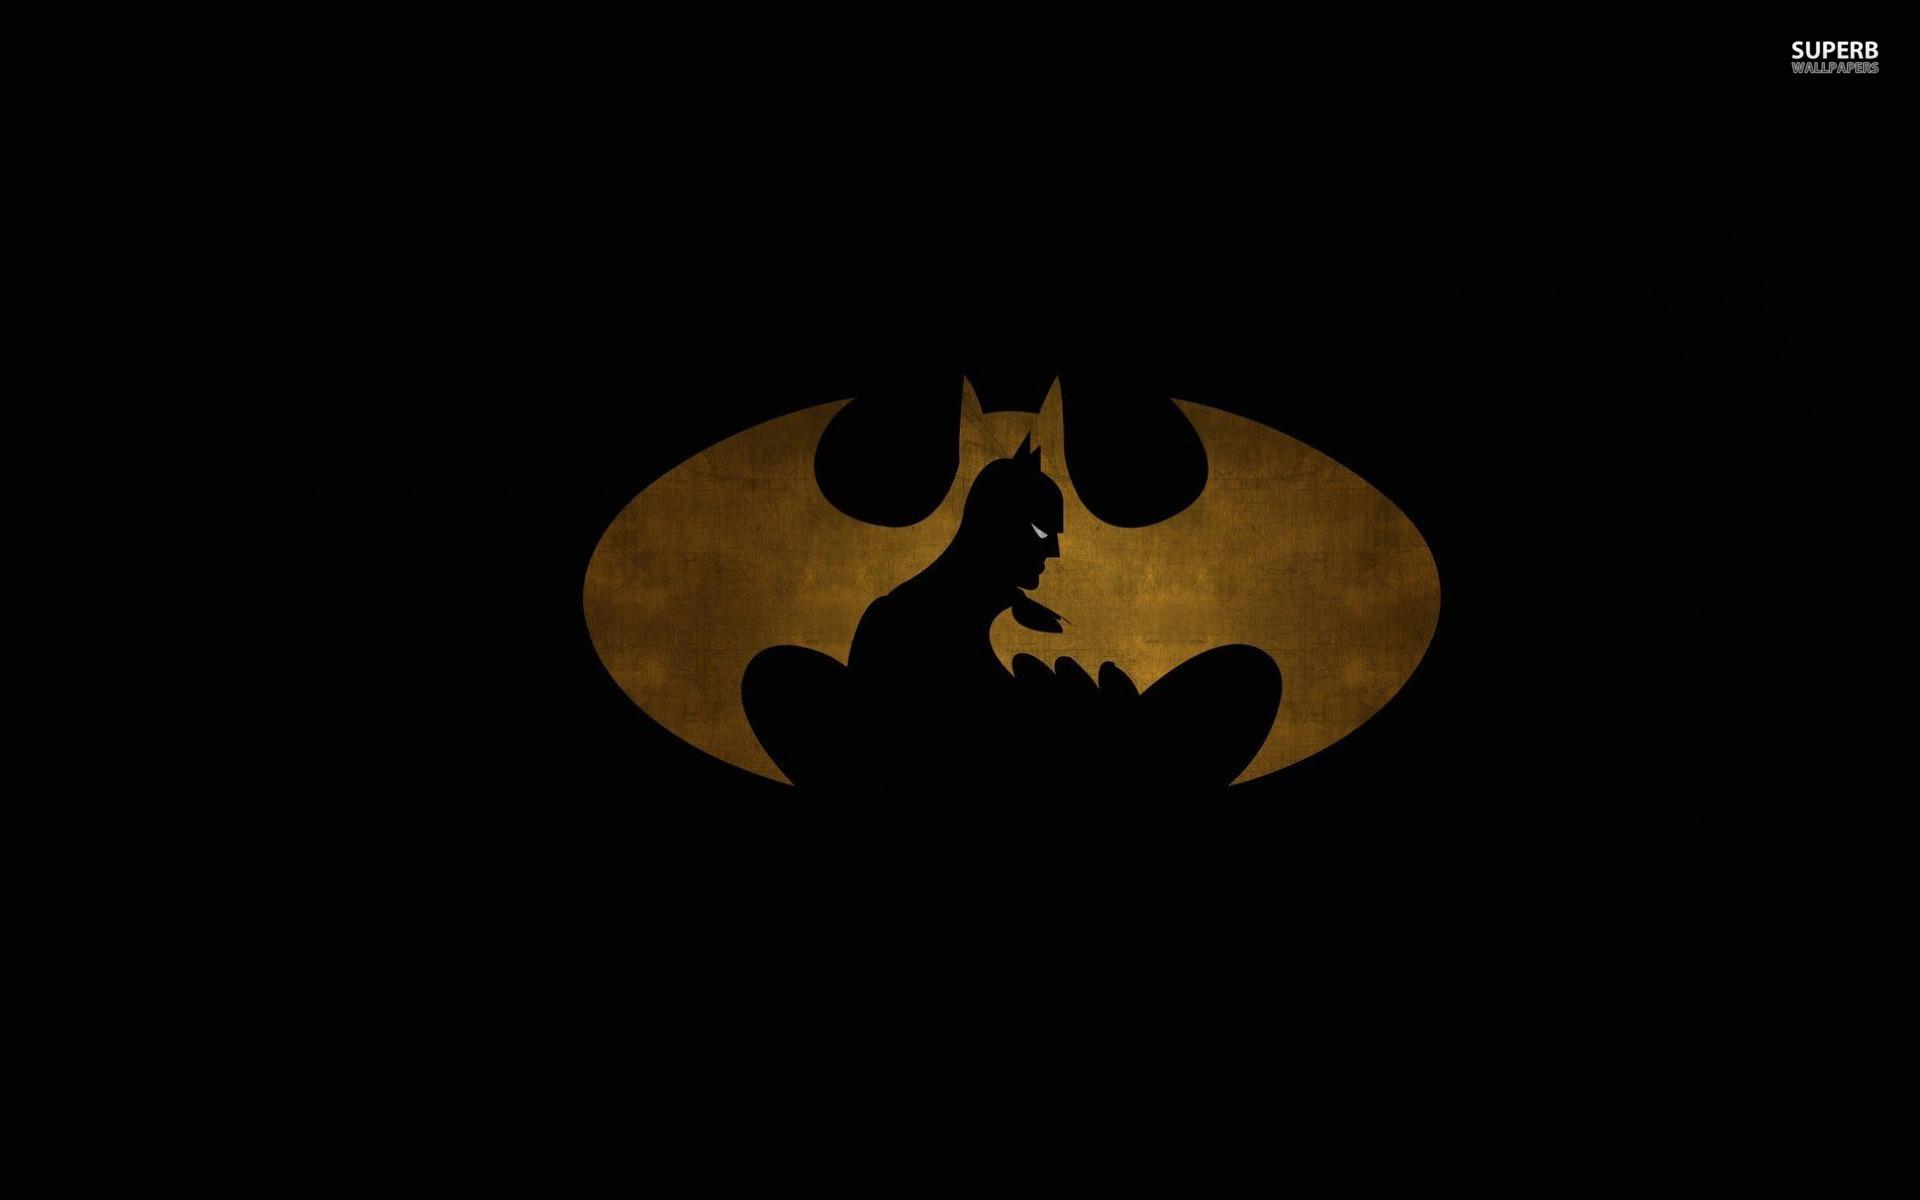 iphone 5 wallpaper batman logo   Favourite Pictures 1920x1200